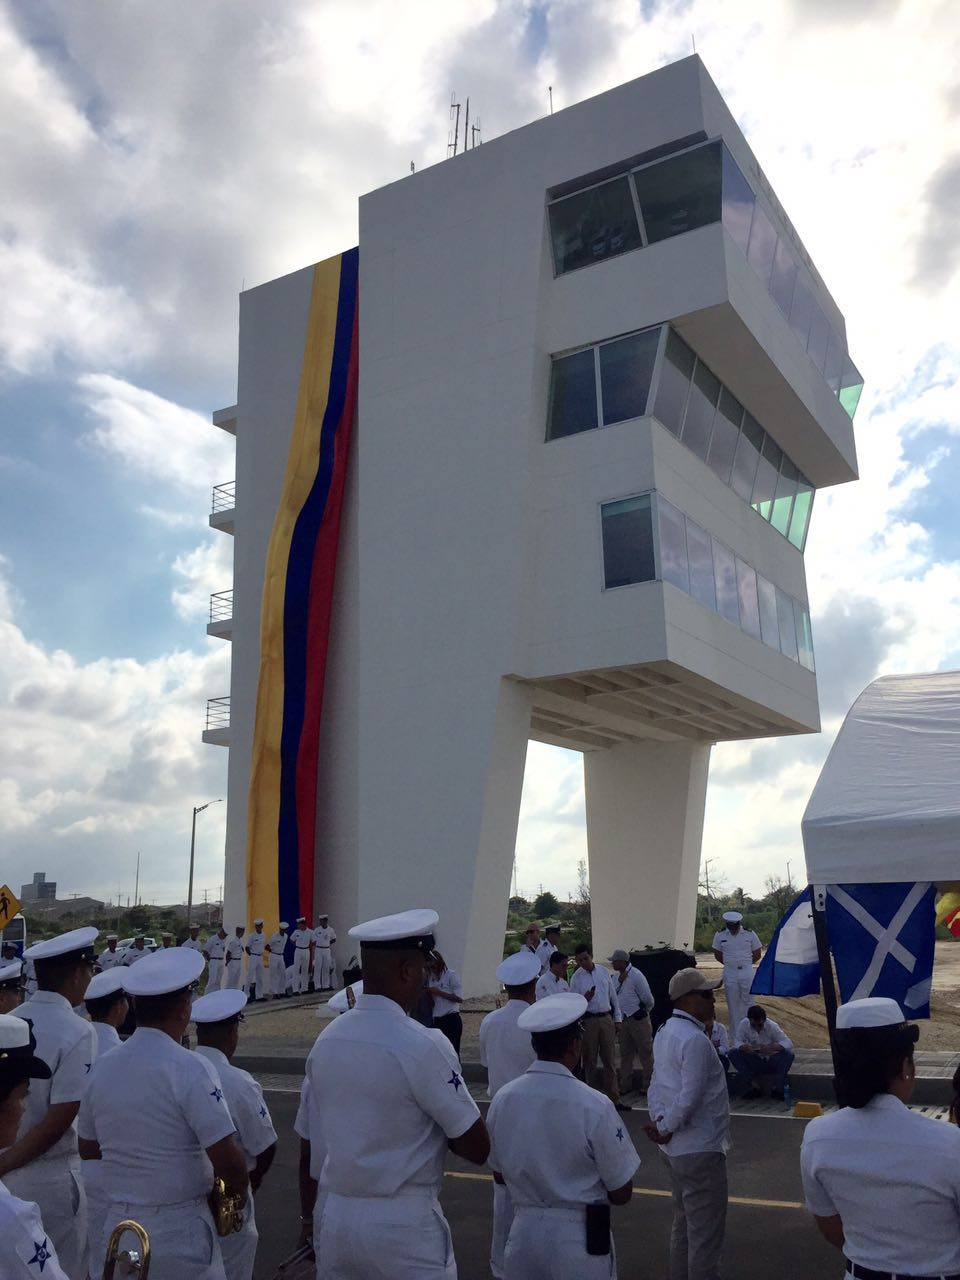 torre control trafico maritimo